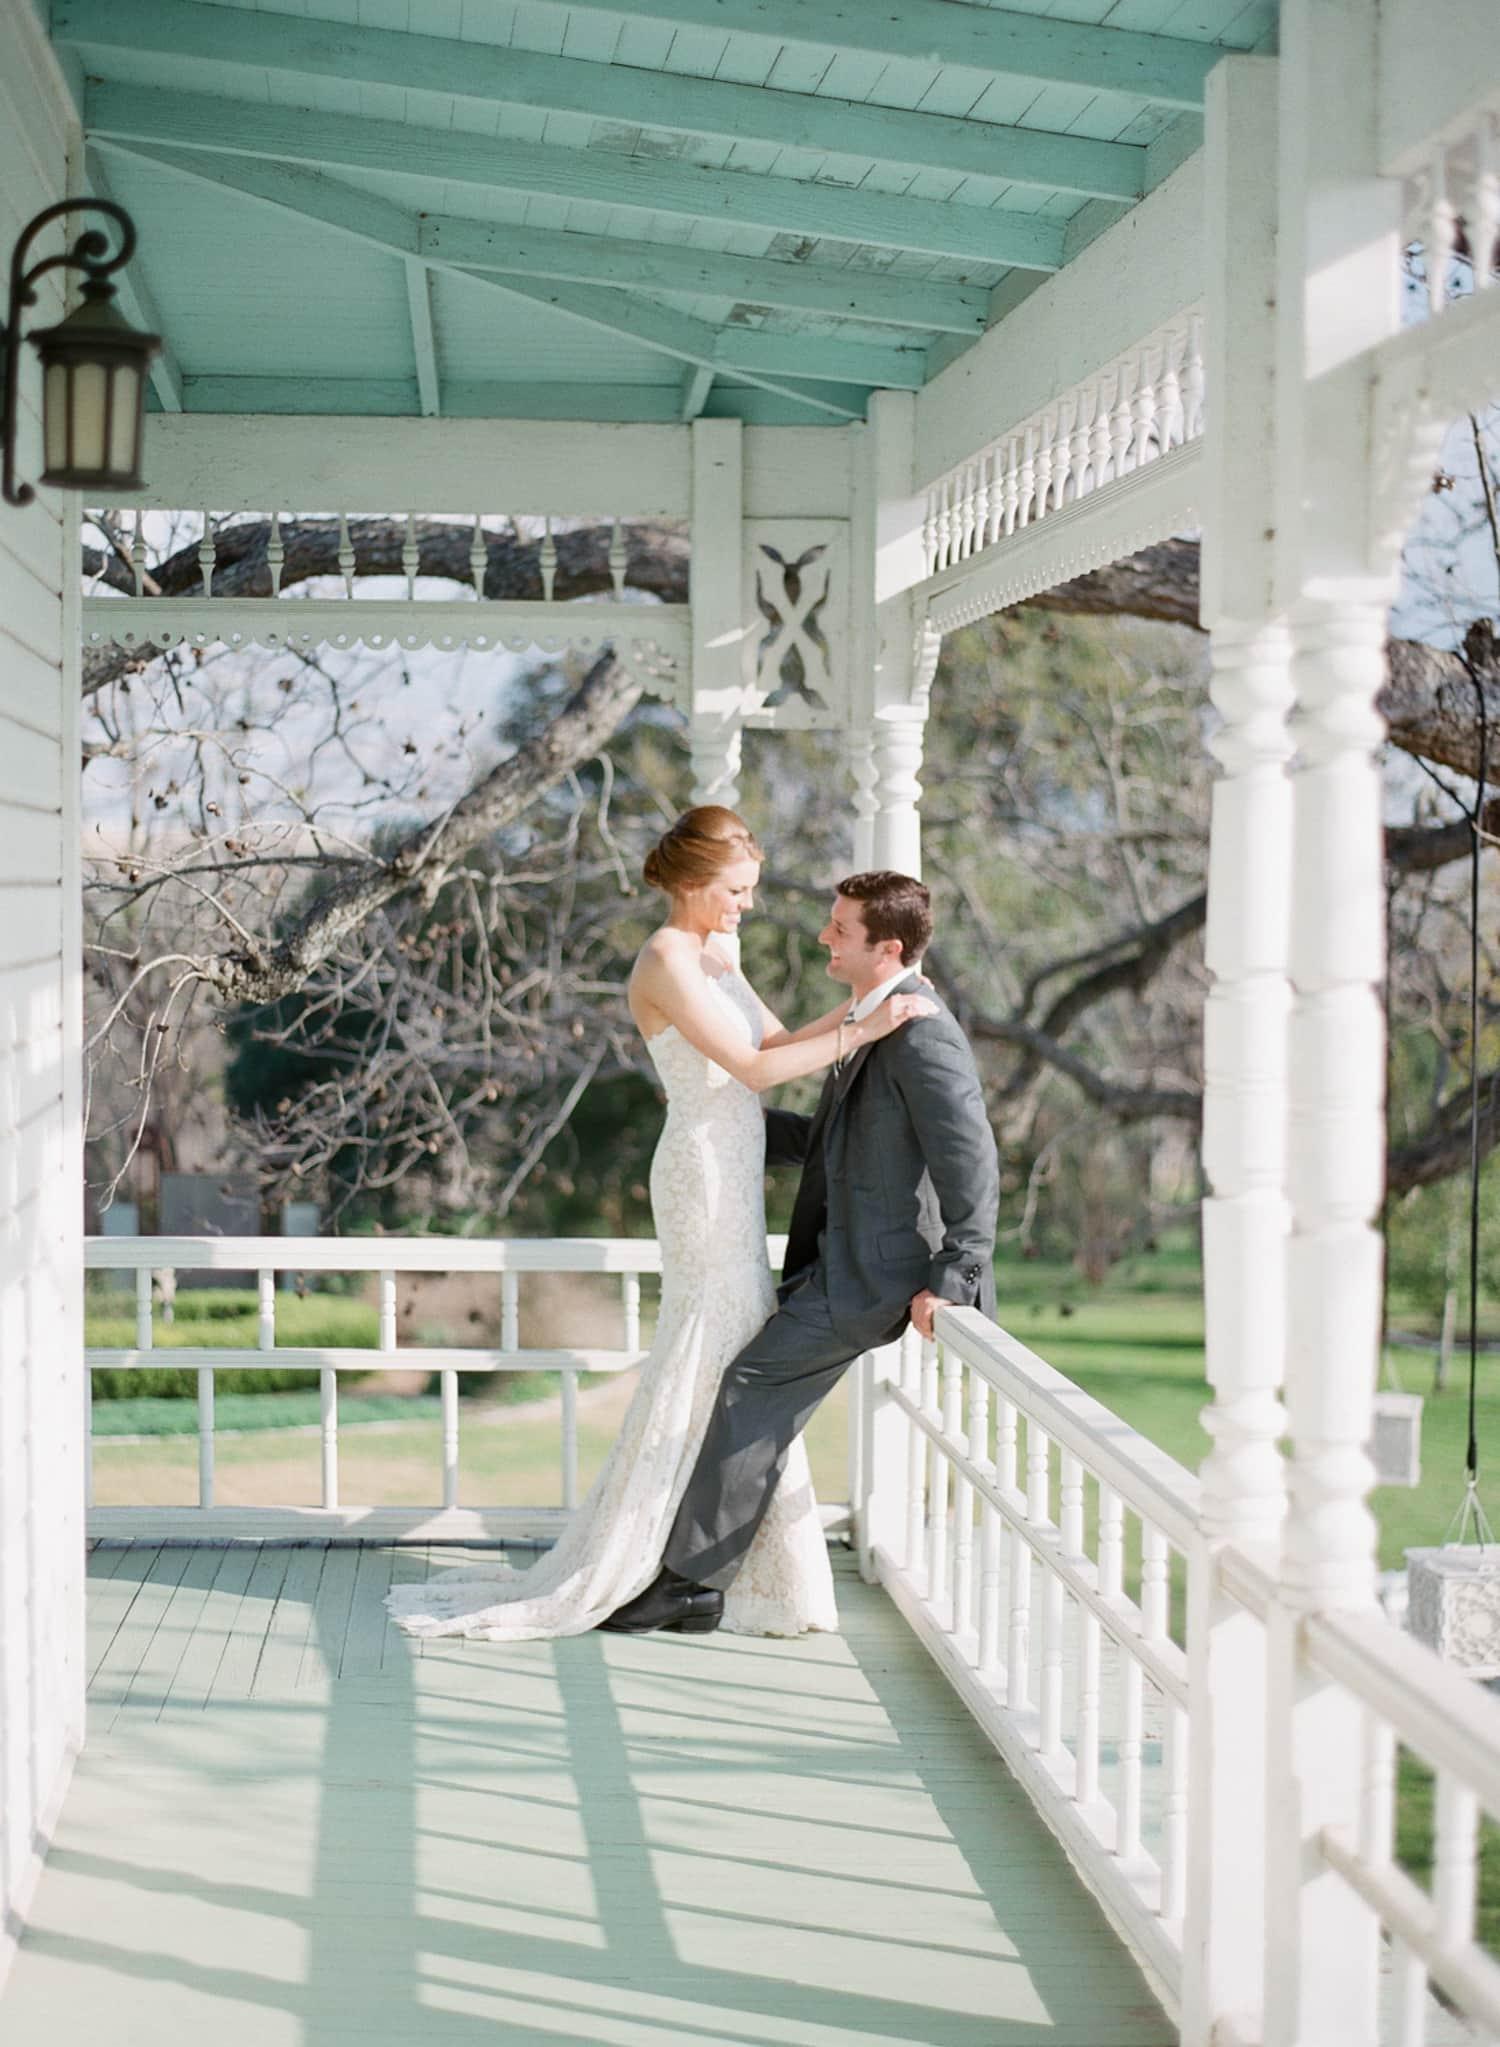 barr-mansion-wedding-38.jpg